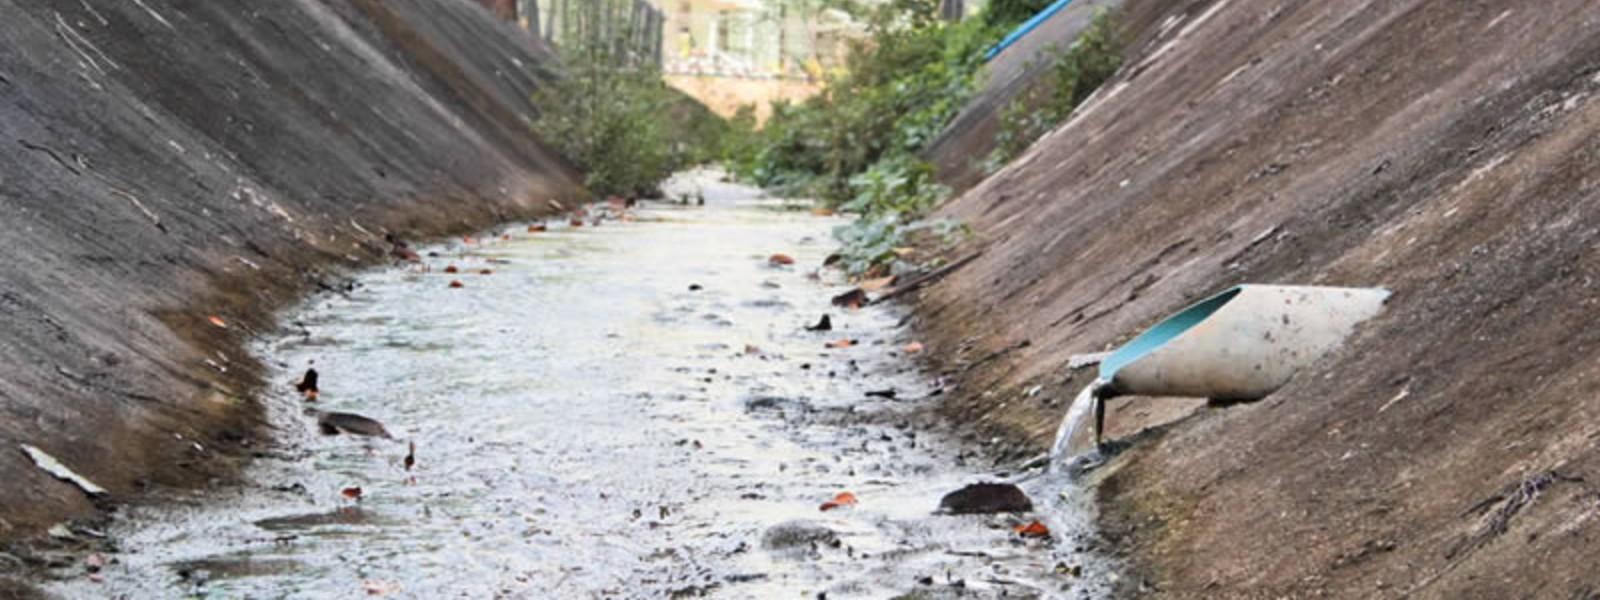 4000 factories on the Kelani river banks do not have proper approvals